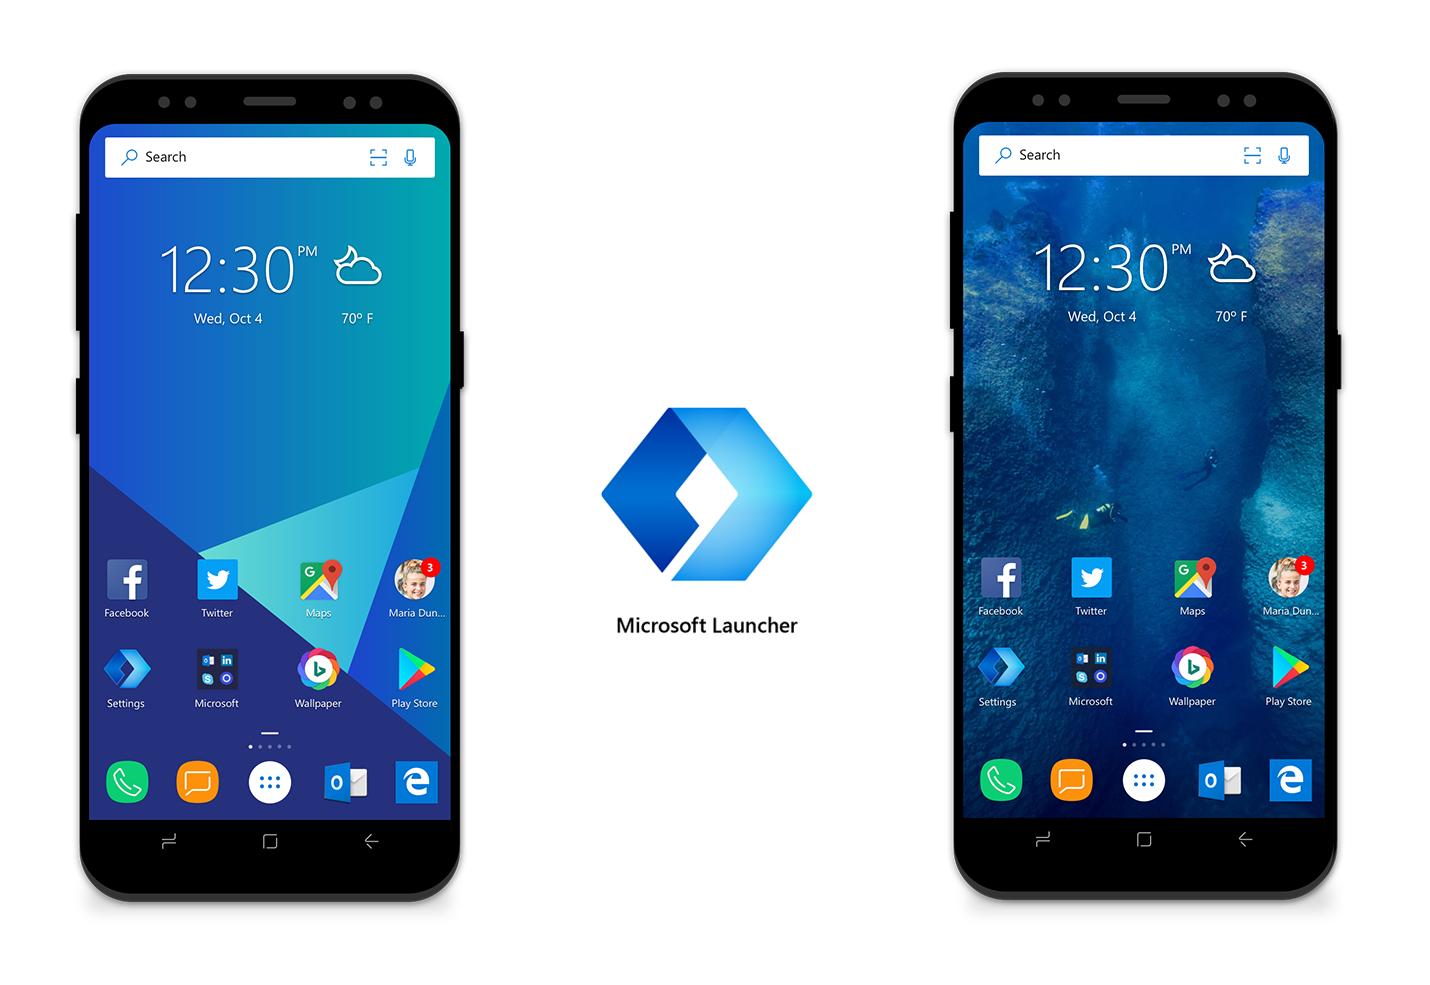 全新的 Microsoft Launcher 為 Android 手機帶來「Continue on PC」